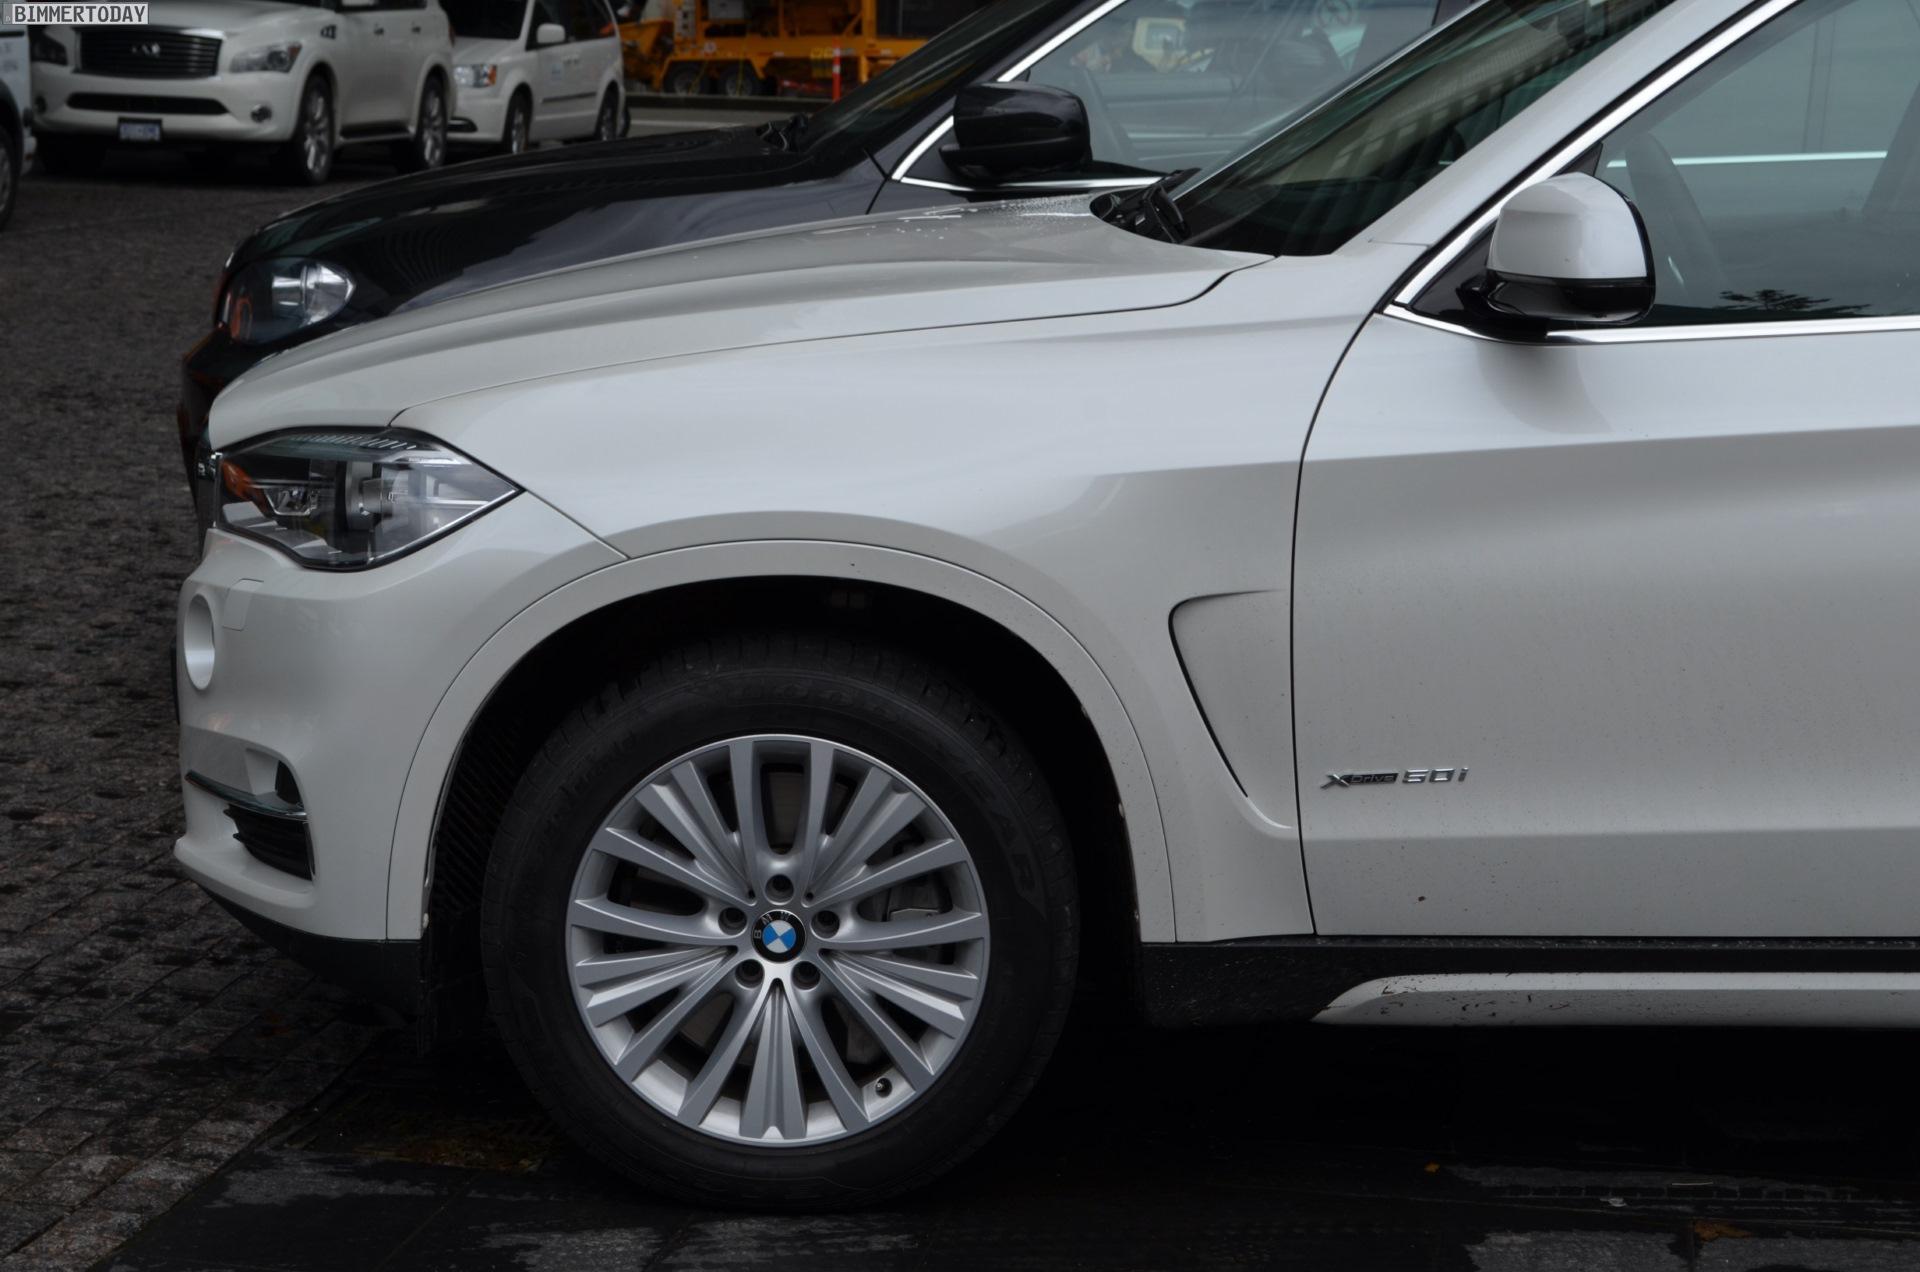 2014 BMW X5 F15 vs E70 Vergleich Foto schwarz weiss 11